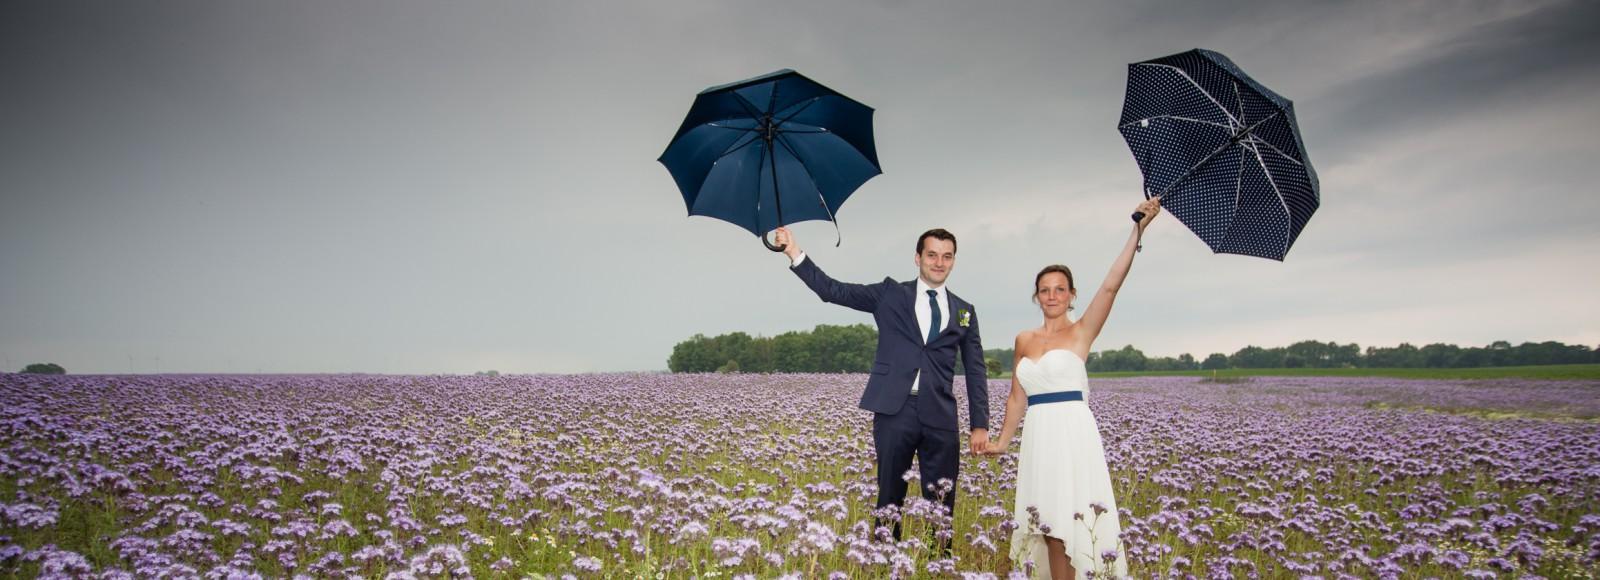 Hochzeitsfotografie-Luptscho.de-02